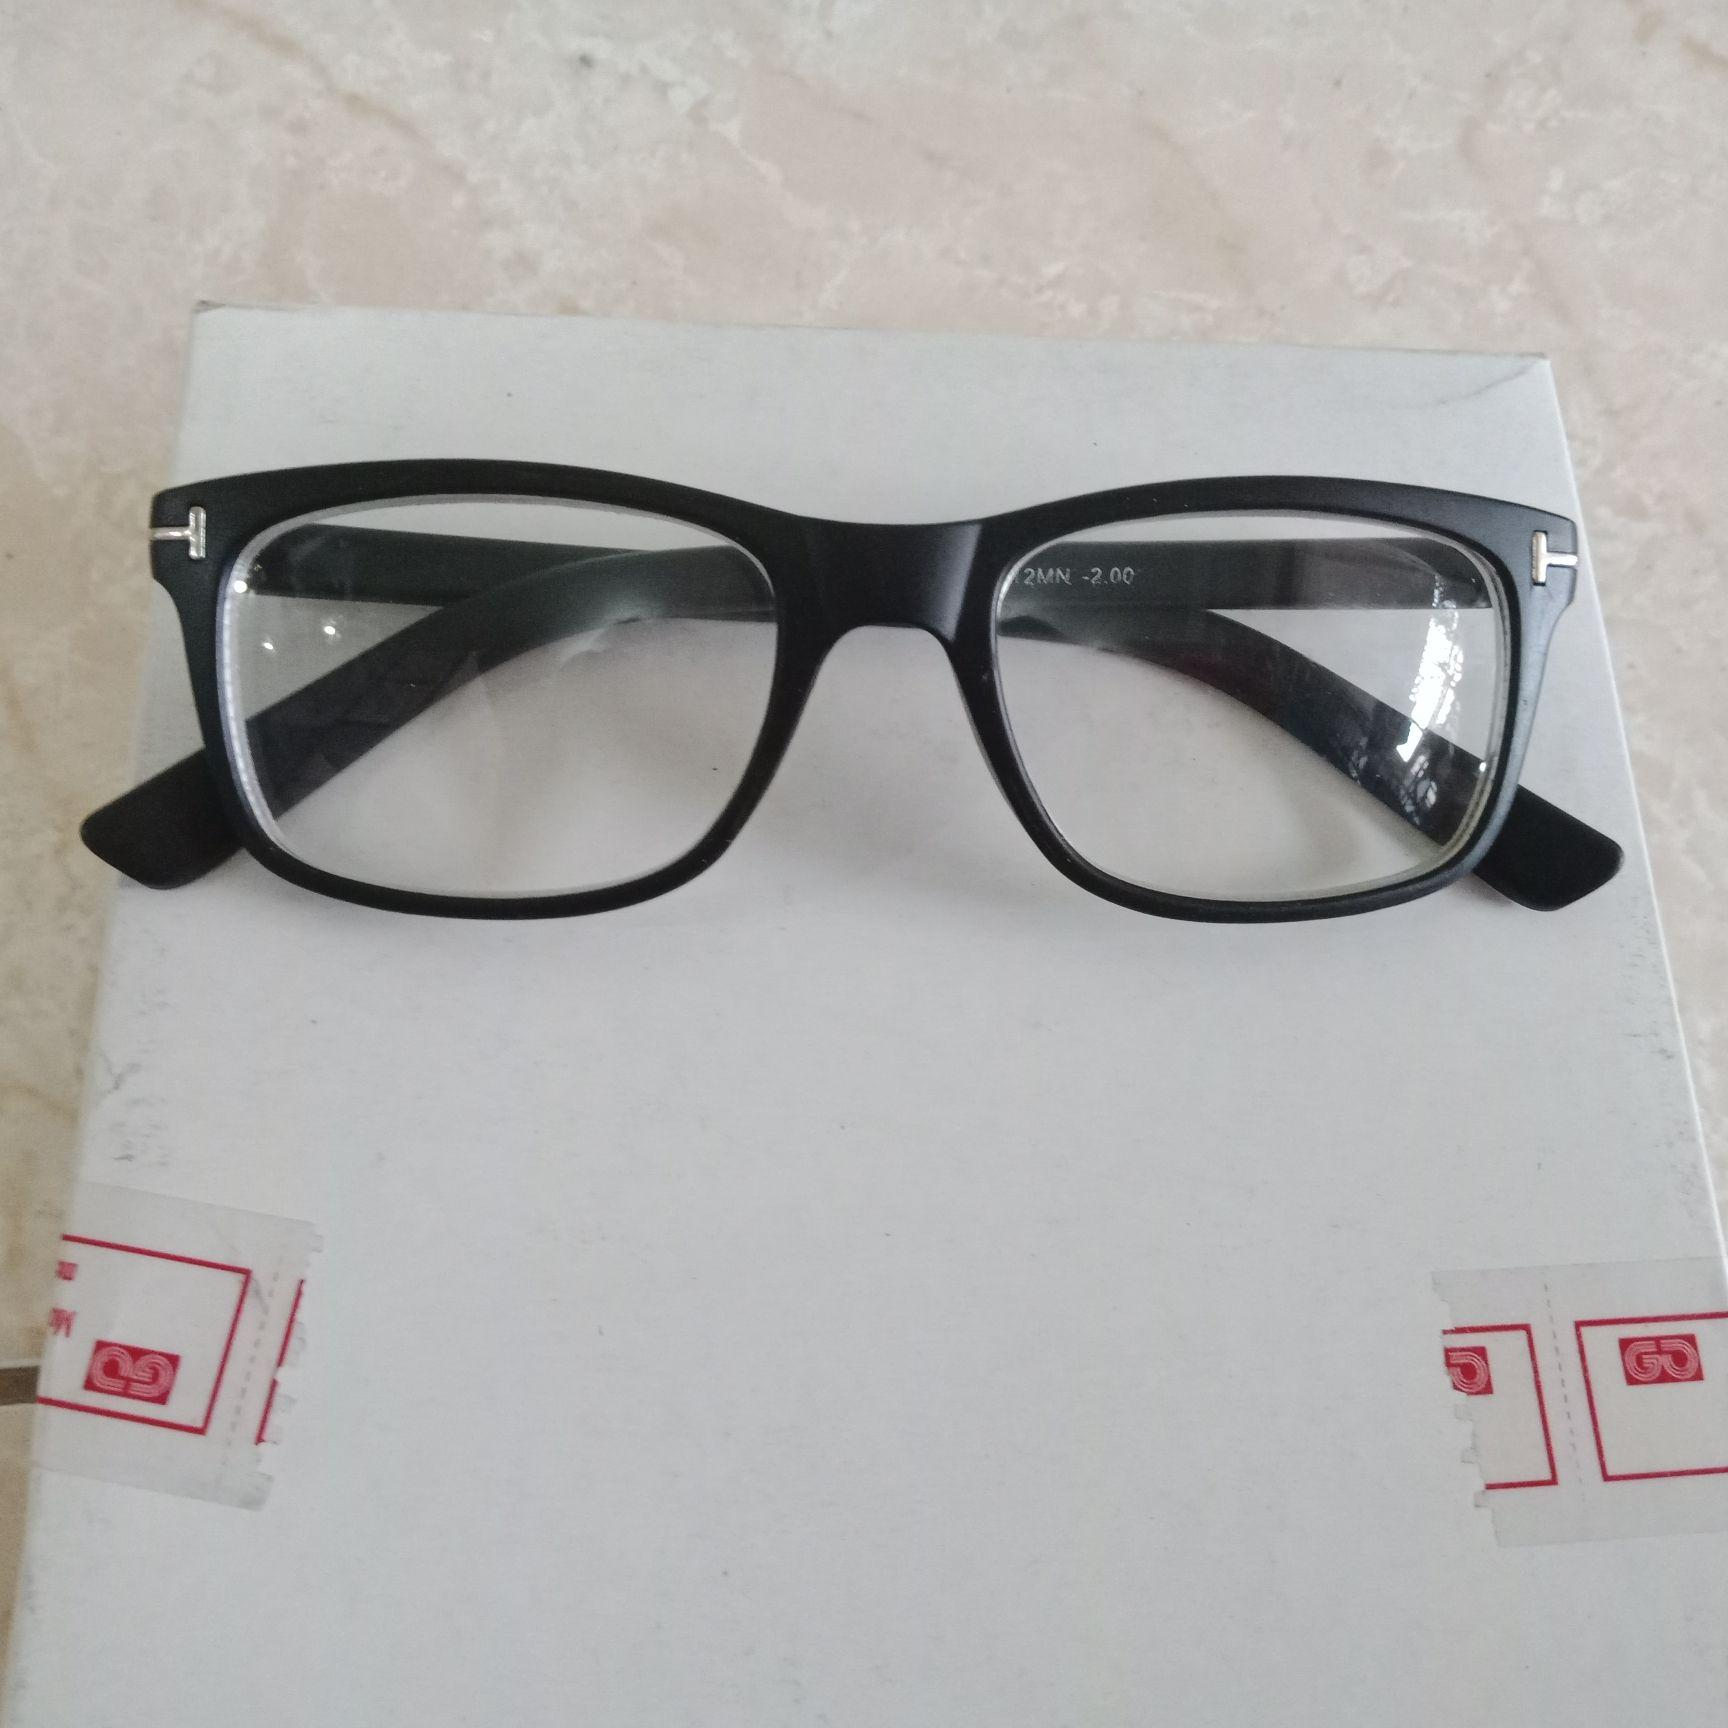 Promo Kacamata Minus 100 Murah Kacamata Baca Oval Coklat Zo114 ... e2dc93346f